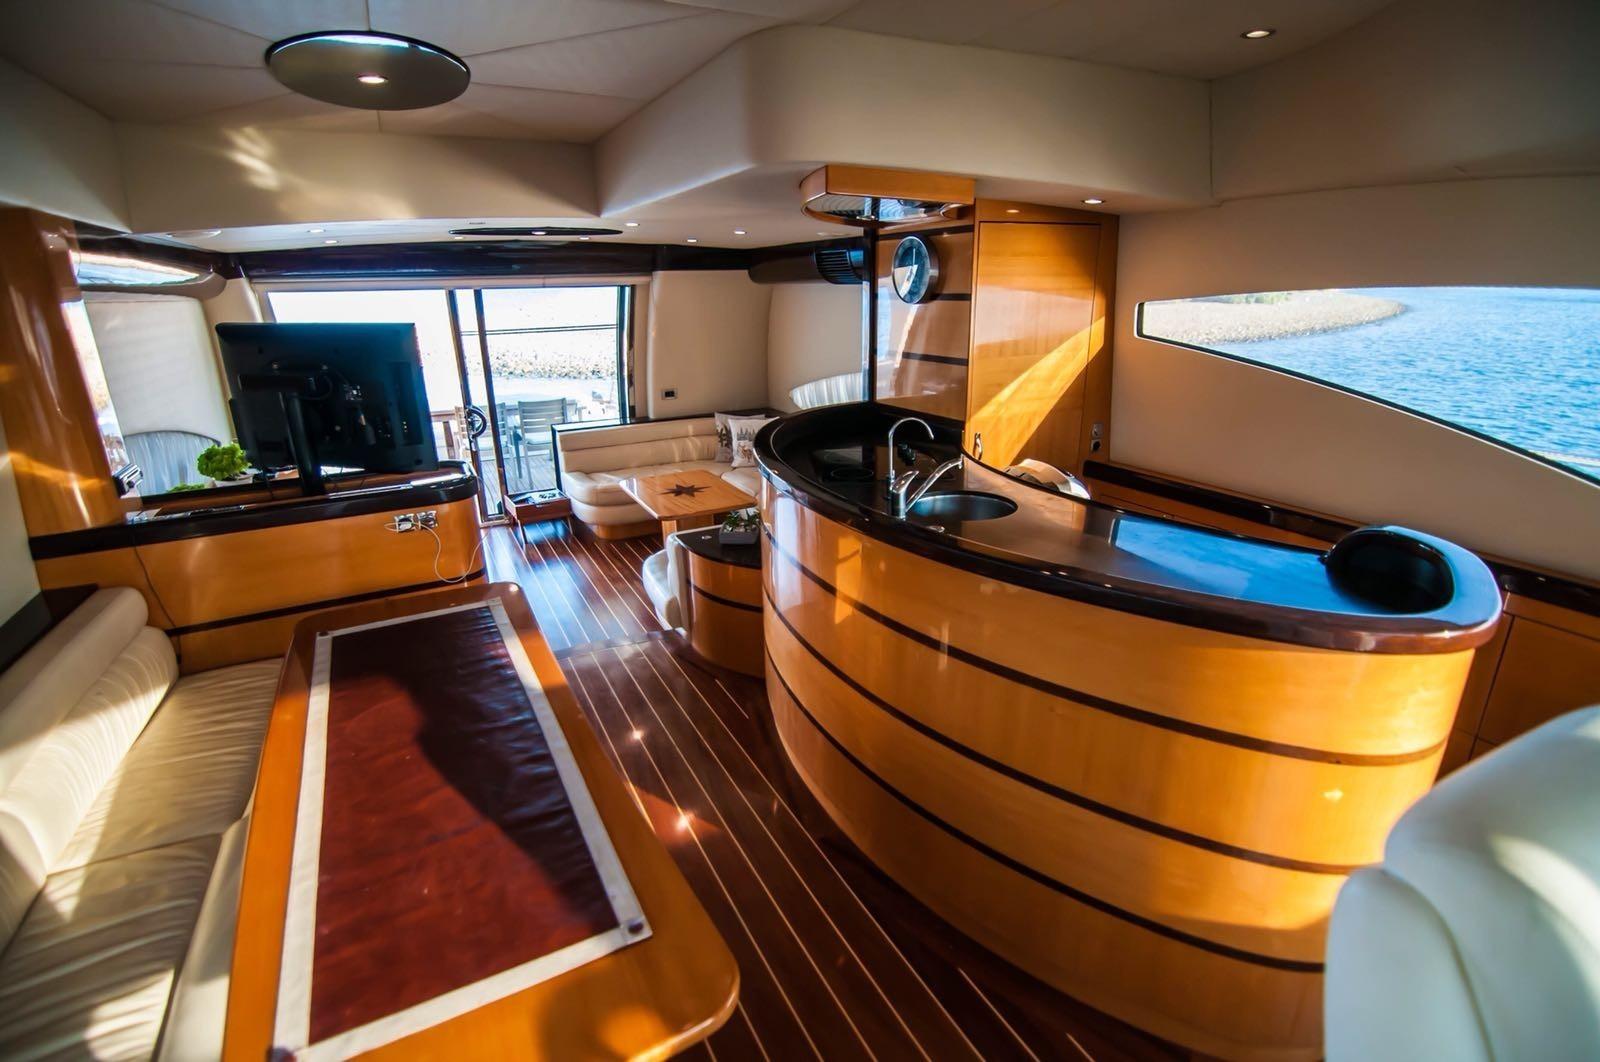 Motor Yacht Durcan Bey